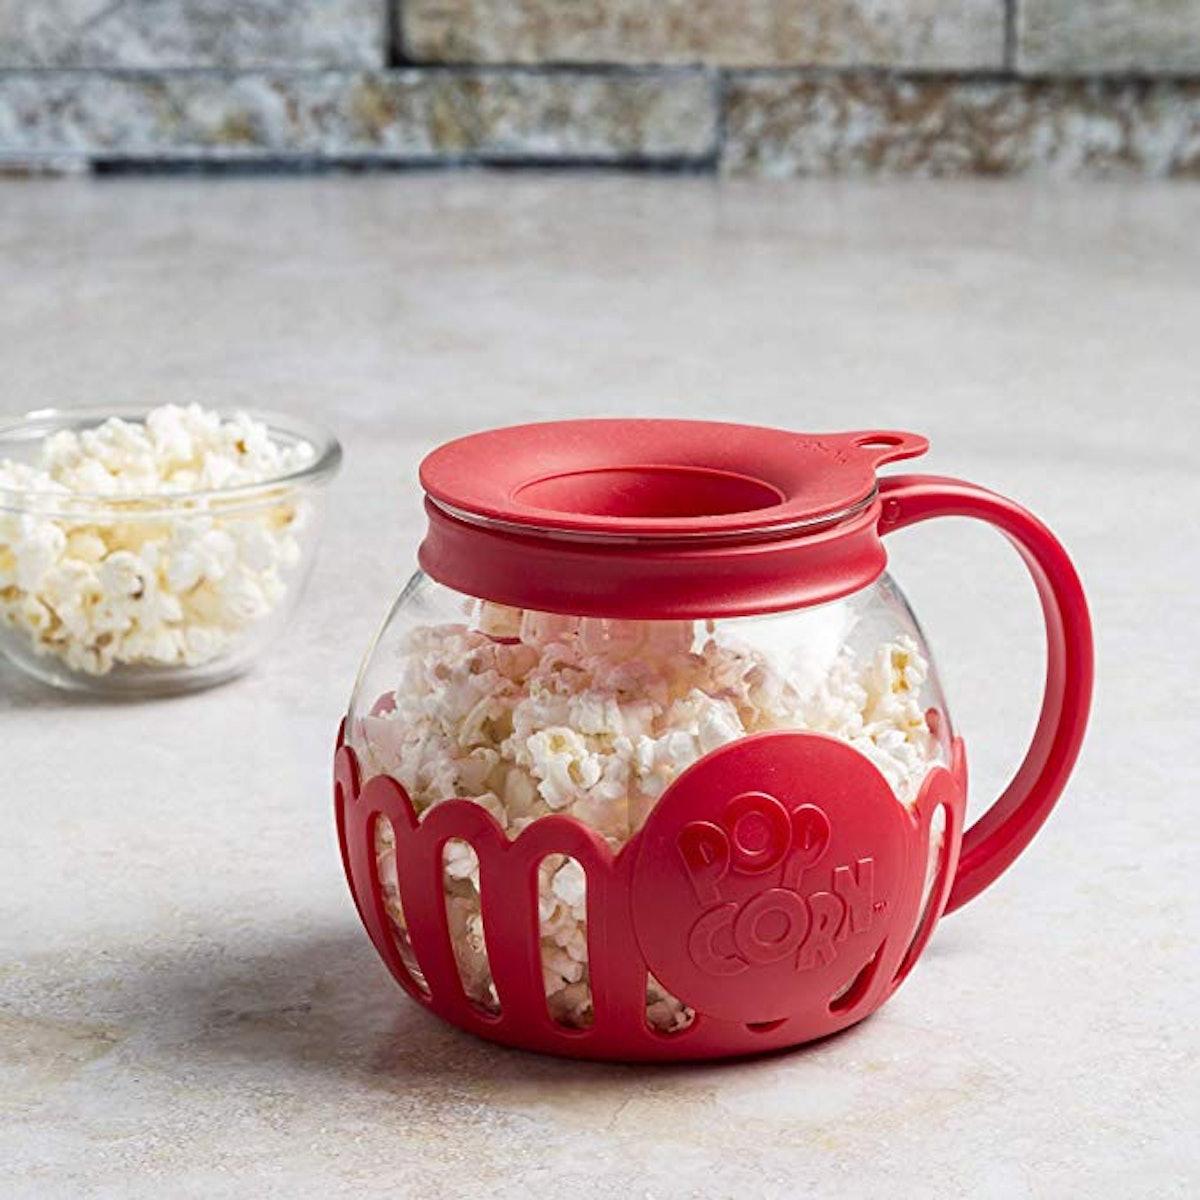 Ecolution Original Microwave Micro-Pop Popcorn Popper